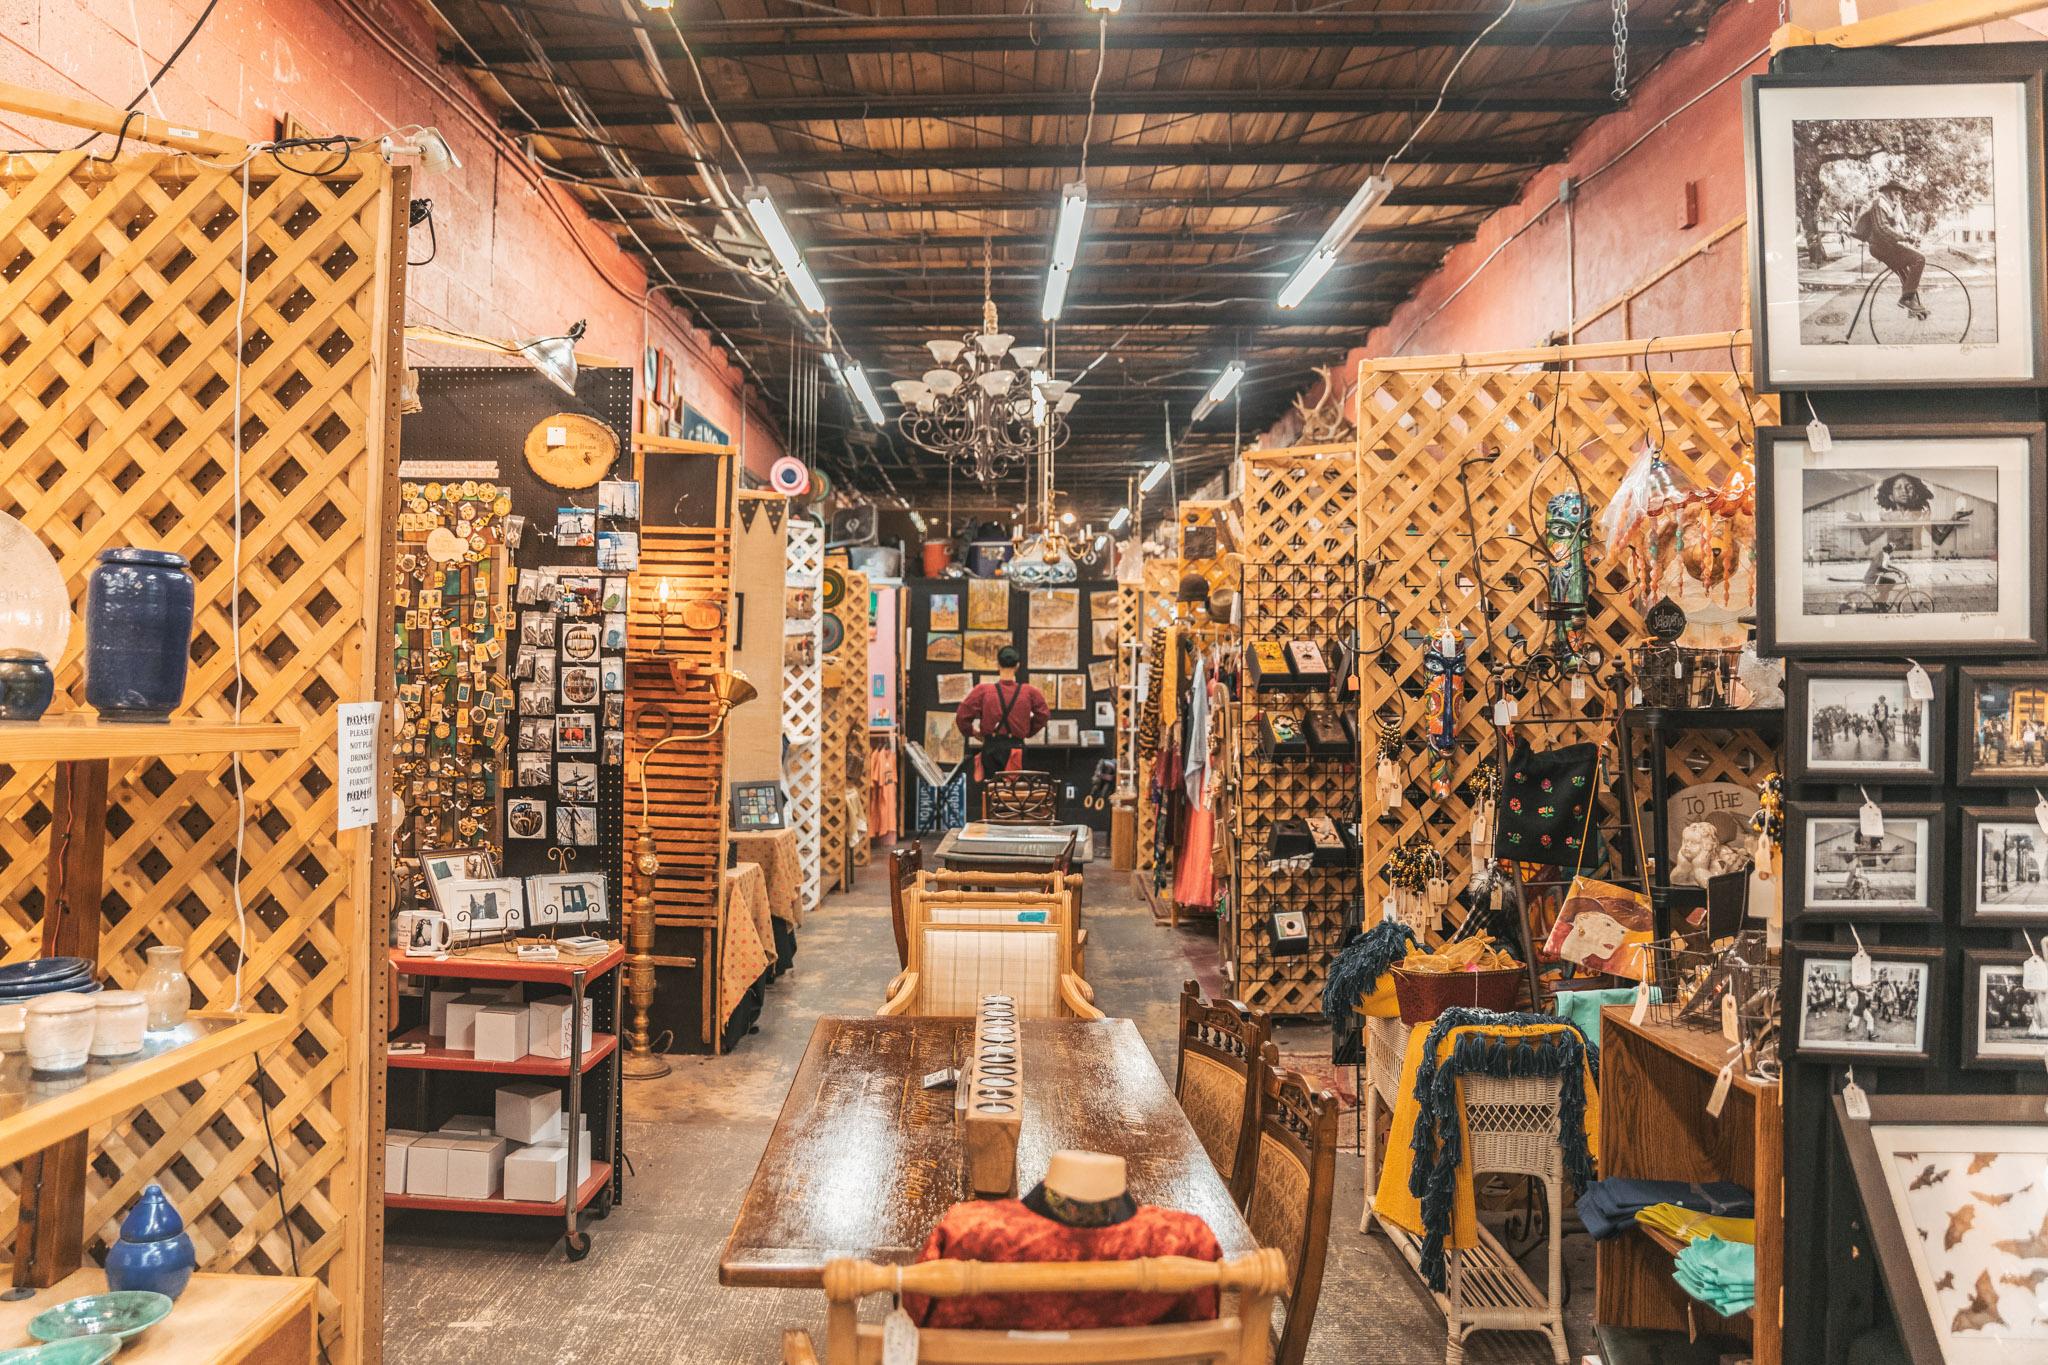 Secondline Arts and Antiques NOLA - The Rainy Day Guide to New Orleans www.readysetjetset.net #readysetjetset